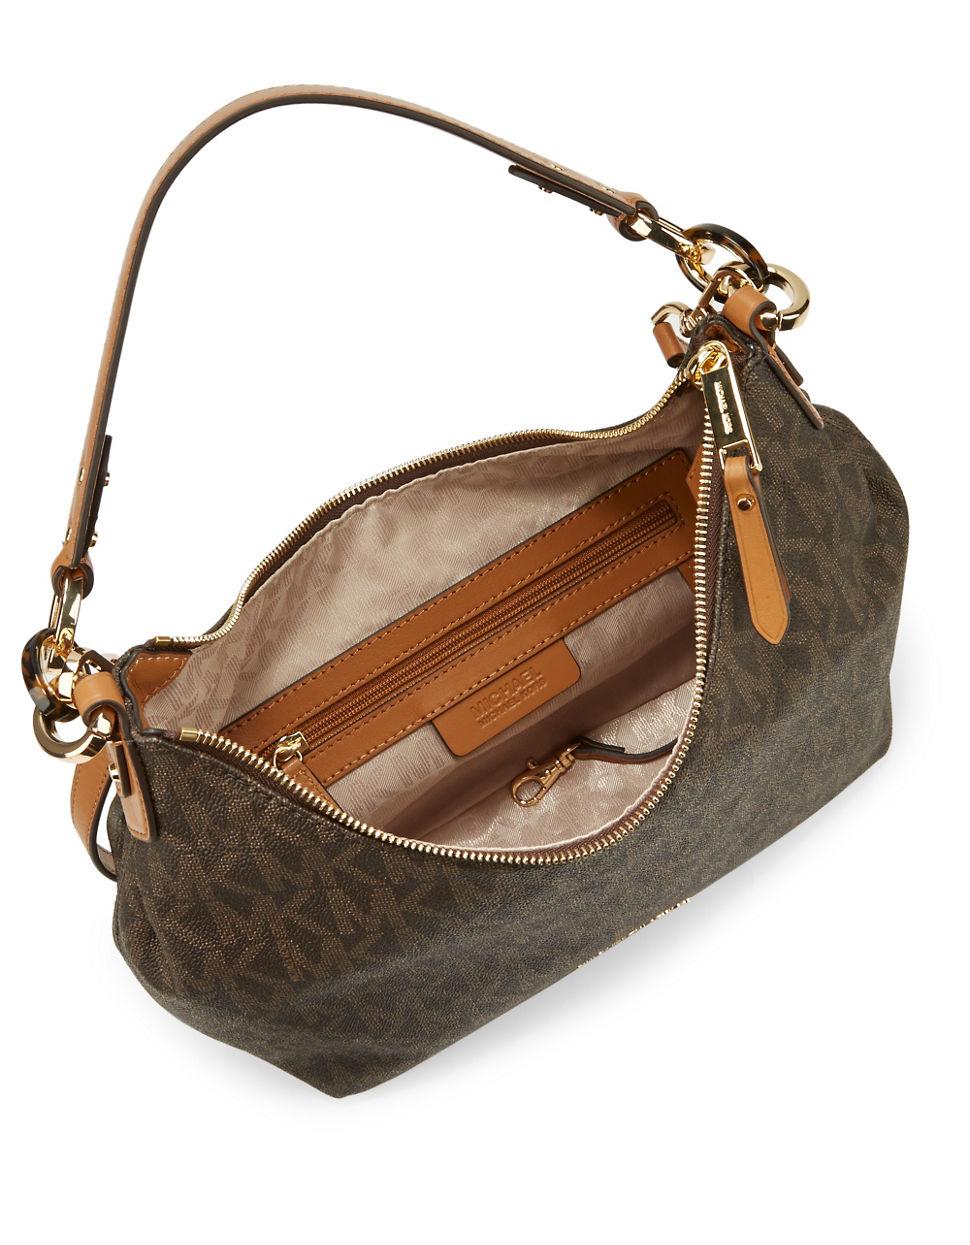 13907d76cde1 Lyst - MICHAEL Michael Kors Isabella Medium Shoulder Bag in Brown